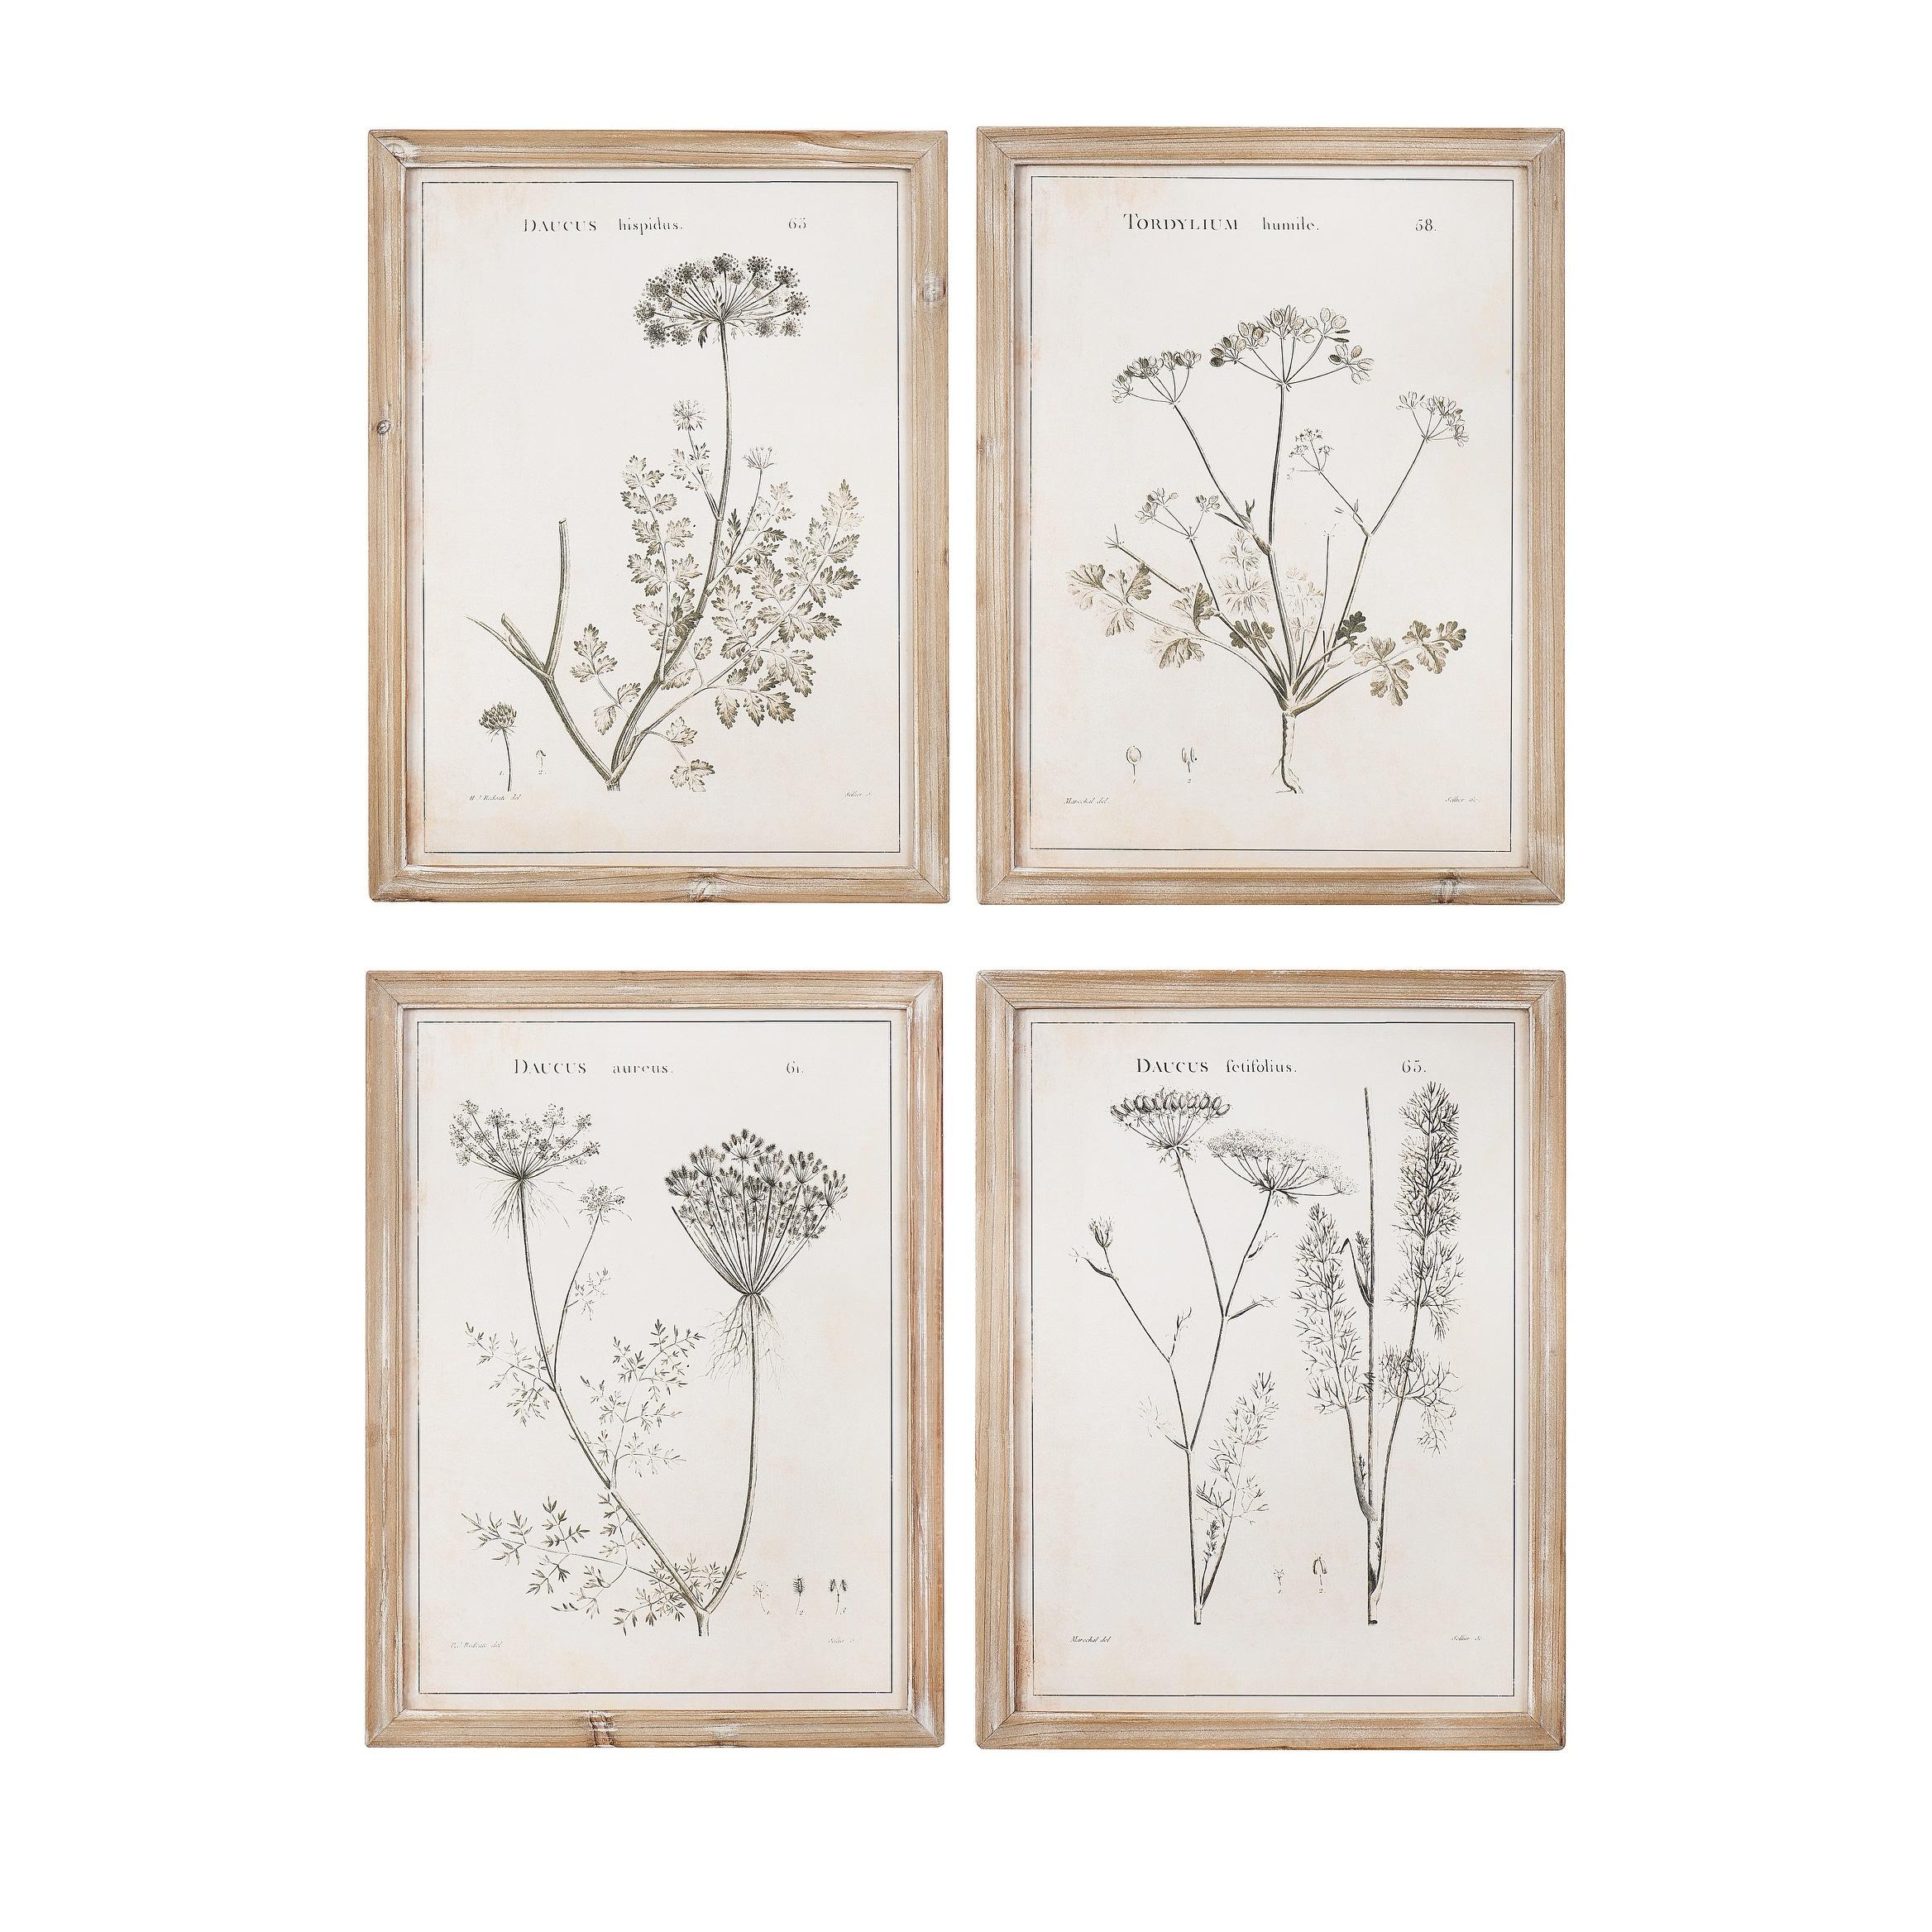 Vintage Reproduction Botanical Print Wood Framed Wall Art Set Of 4 Styles Beige On Sale Overstock 31298554